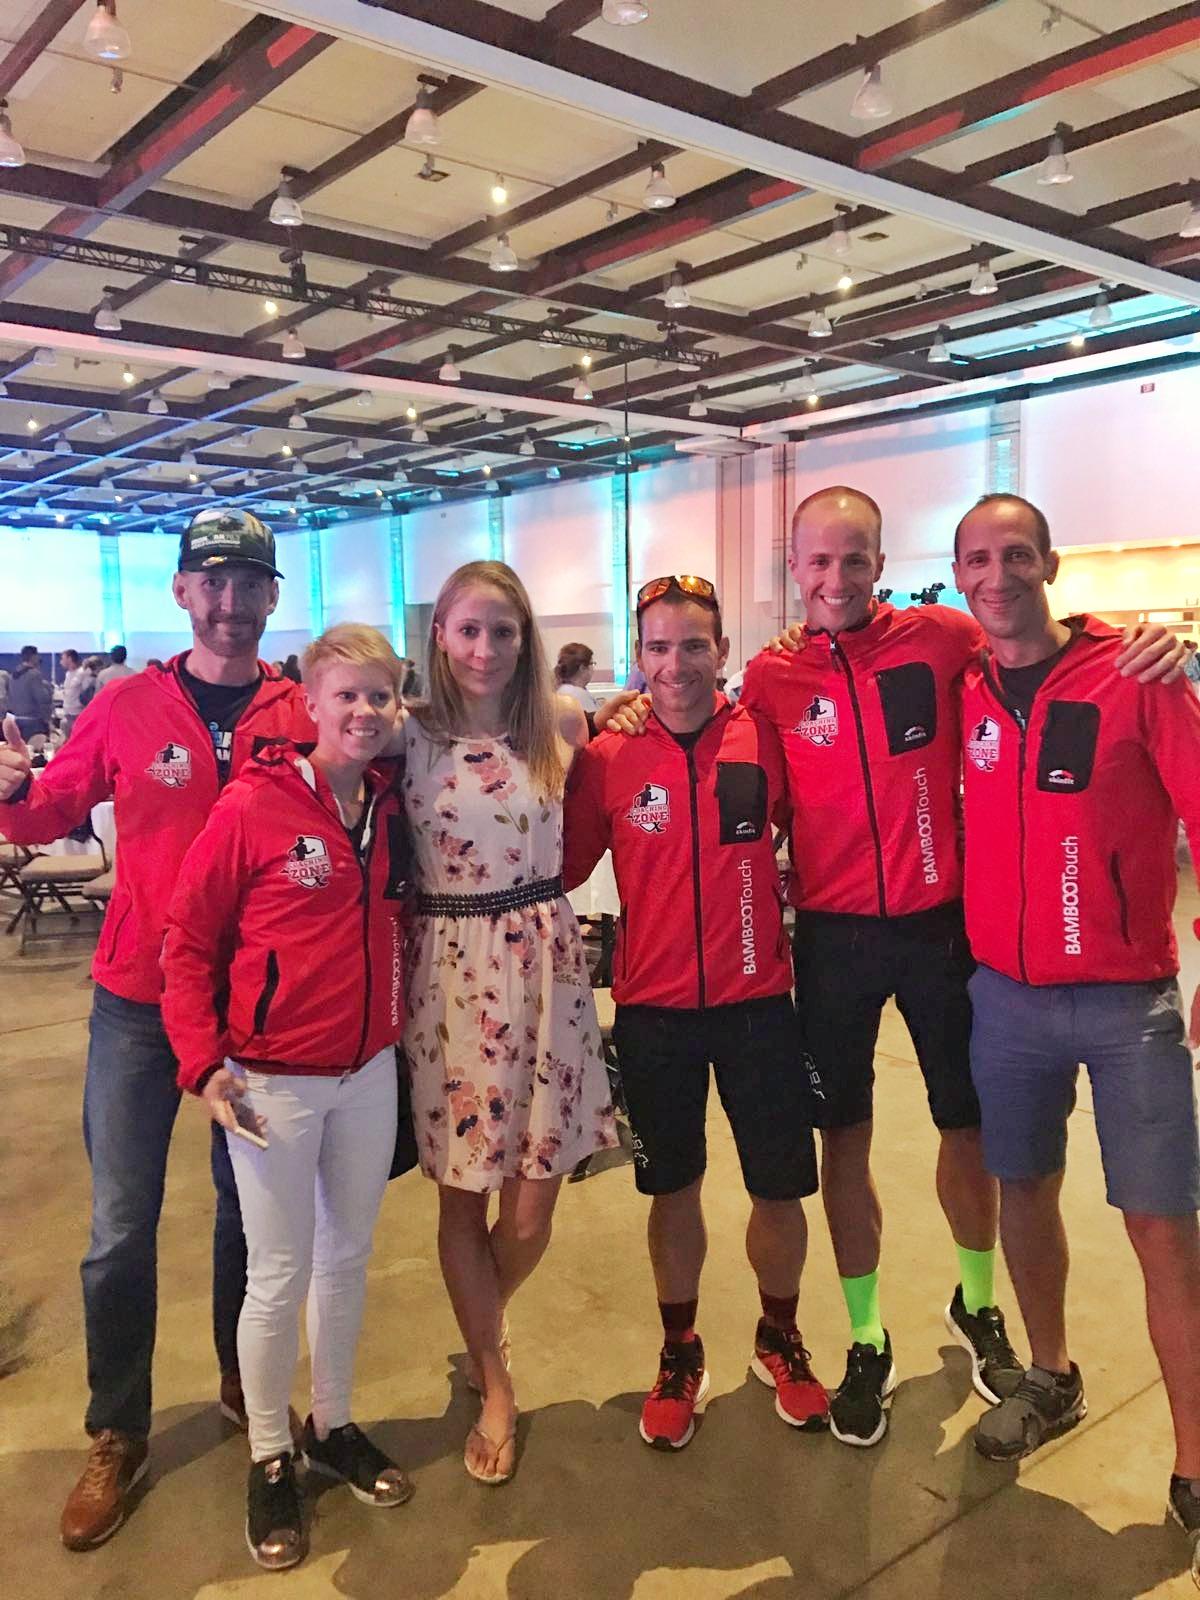 Coaching Zone team with the Ironman World Champion Daniela Ryf